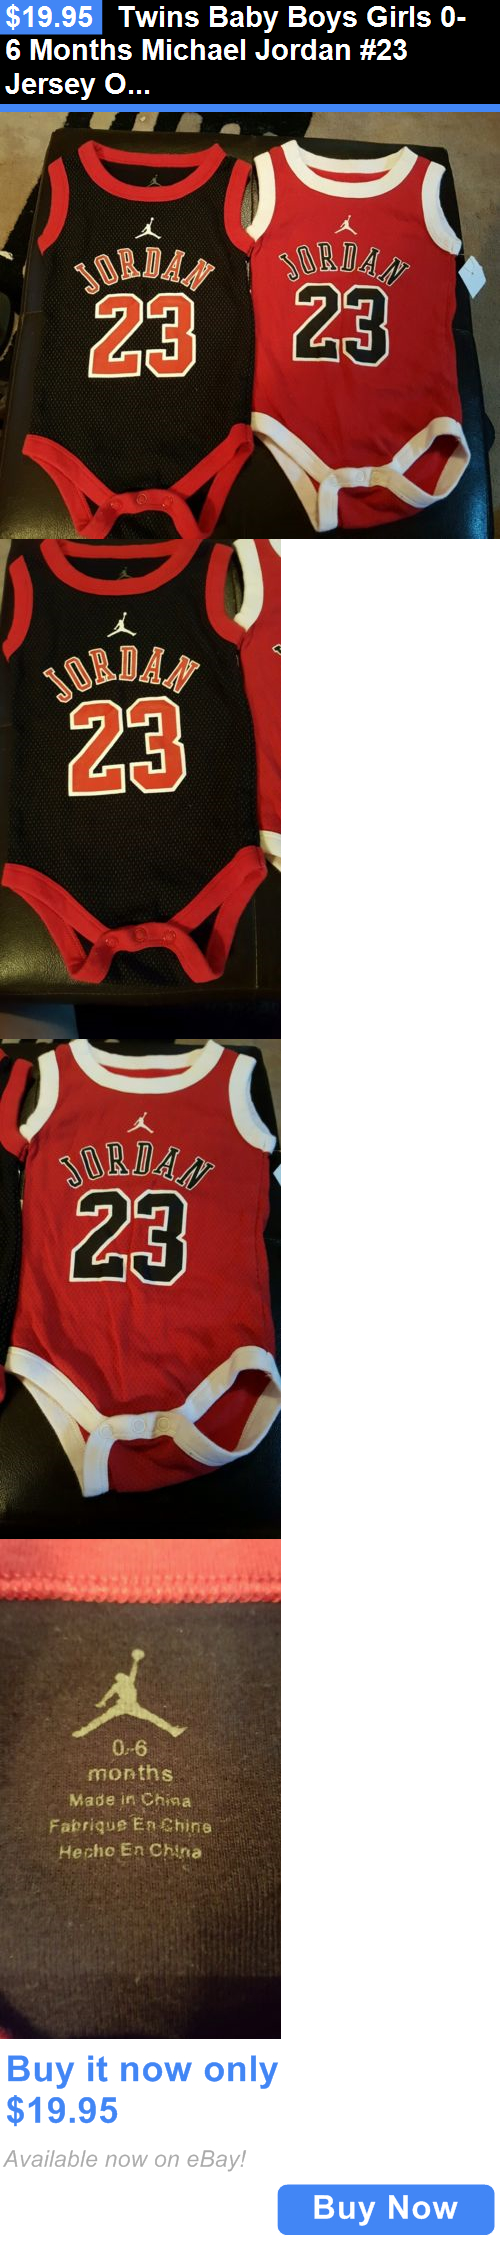 8f41bfcc198718 Michael Jordan Baby Clothing  Twins Baby Boys Girls 0-6 Months Michael  Jordan  23 Jersey Onesies Nba Bulls BUY IT NOW ONLY   19.95